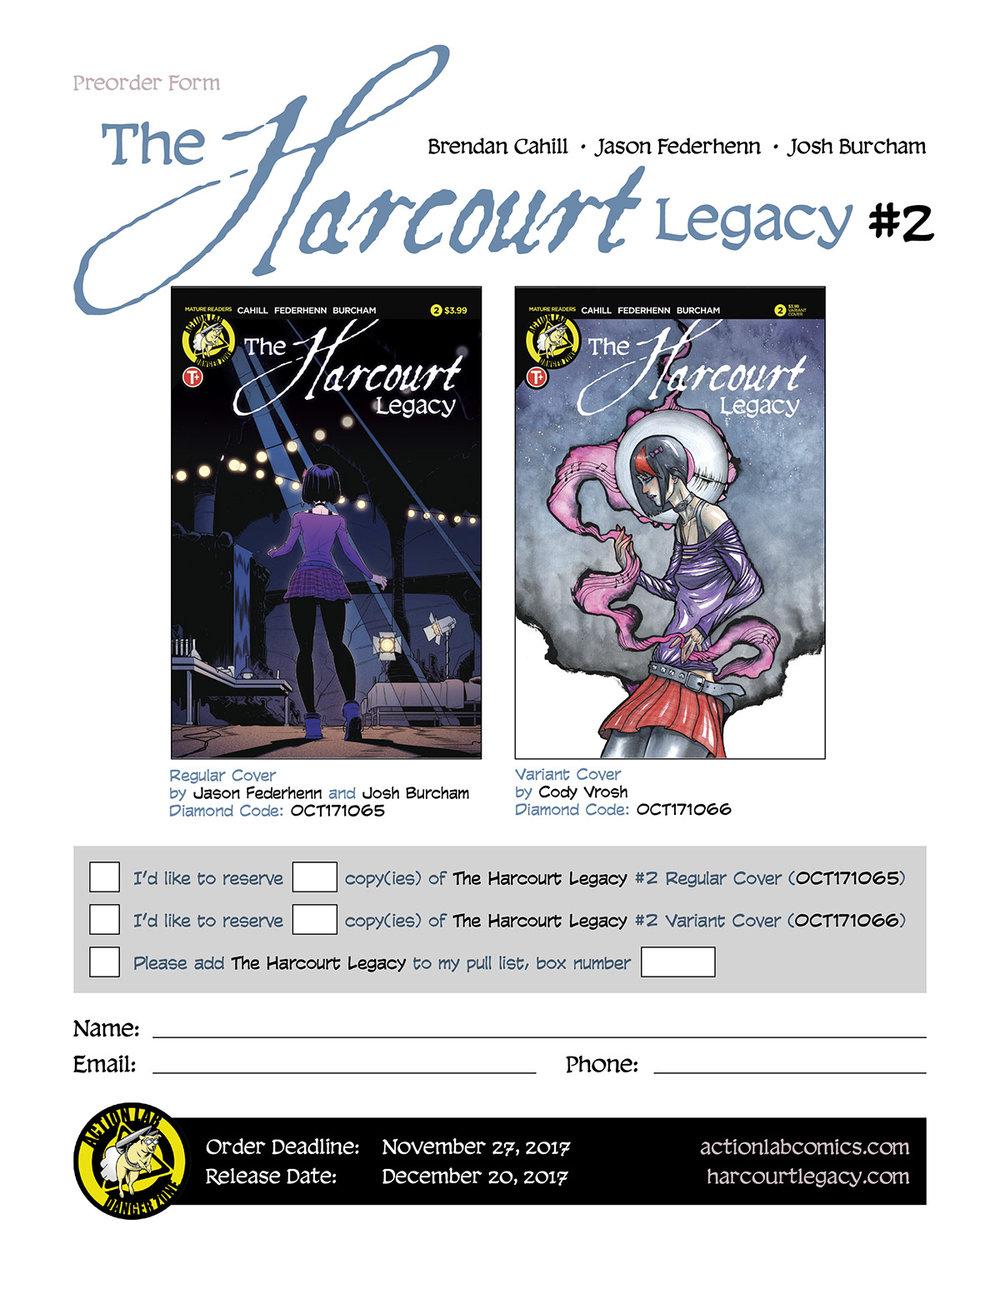 Harcourt_OrderSheet_02.jpg